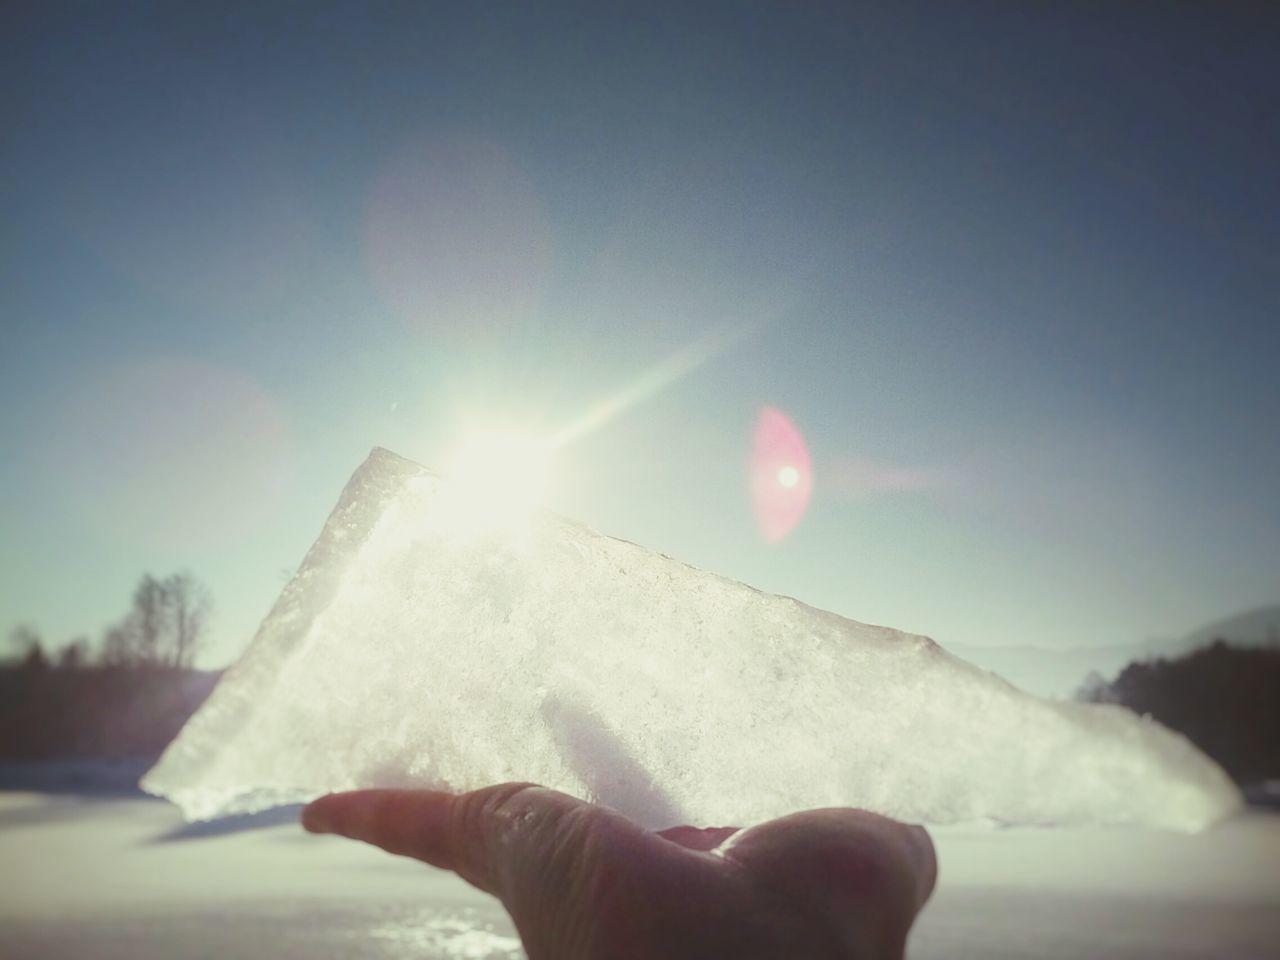 Block Of Ice Polygon Sun Glare Close Up Winter Landscape In Hand